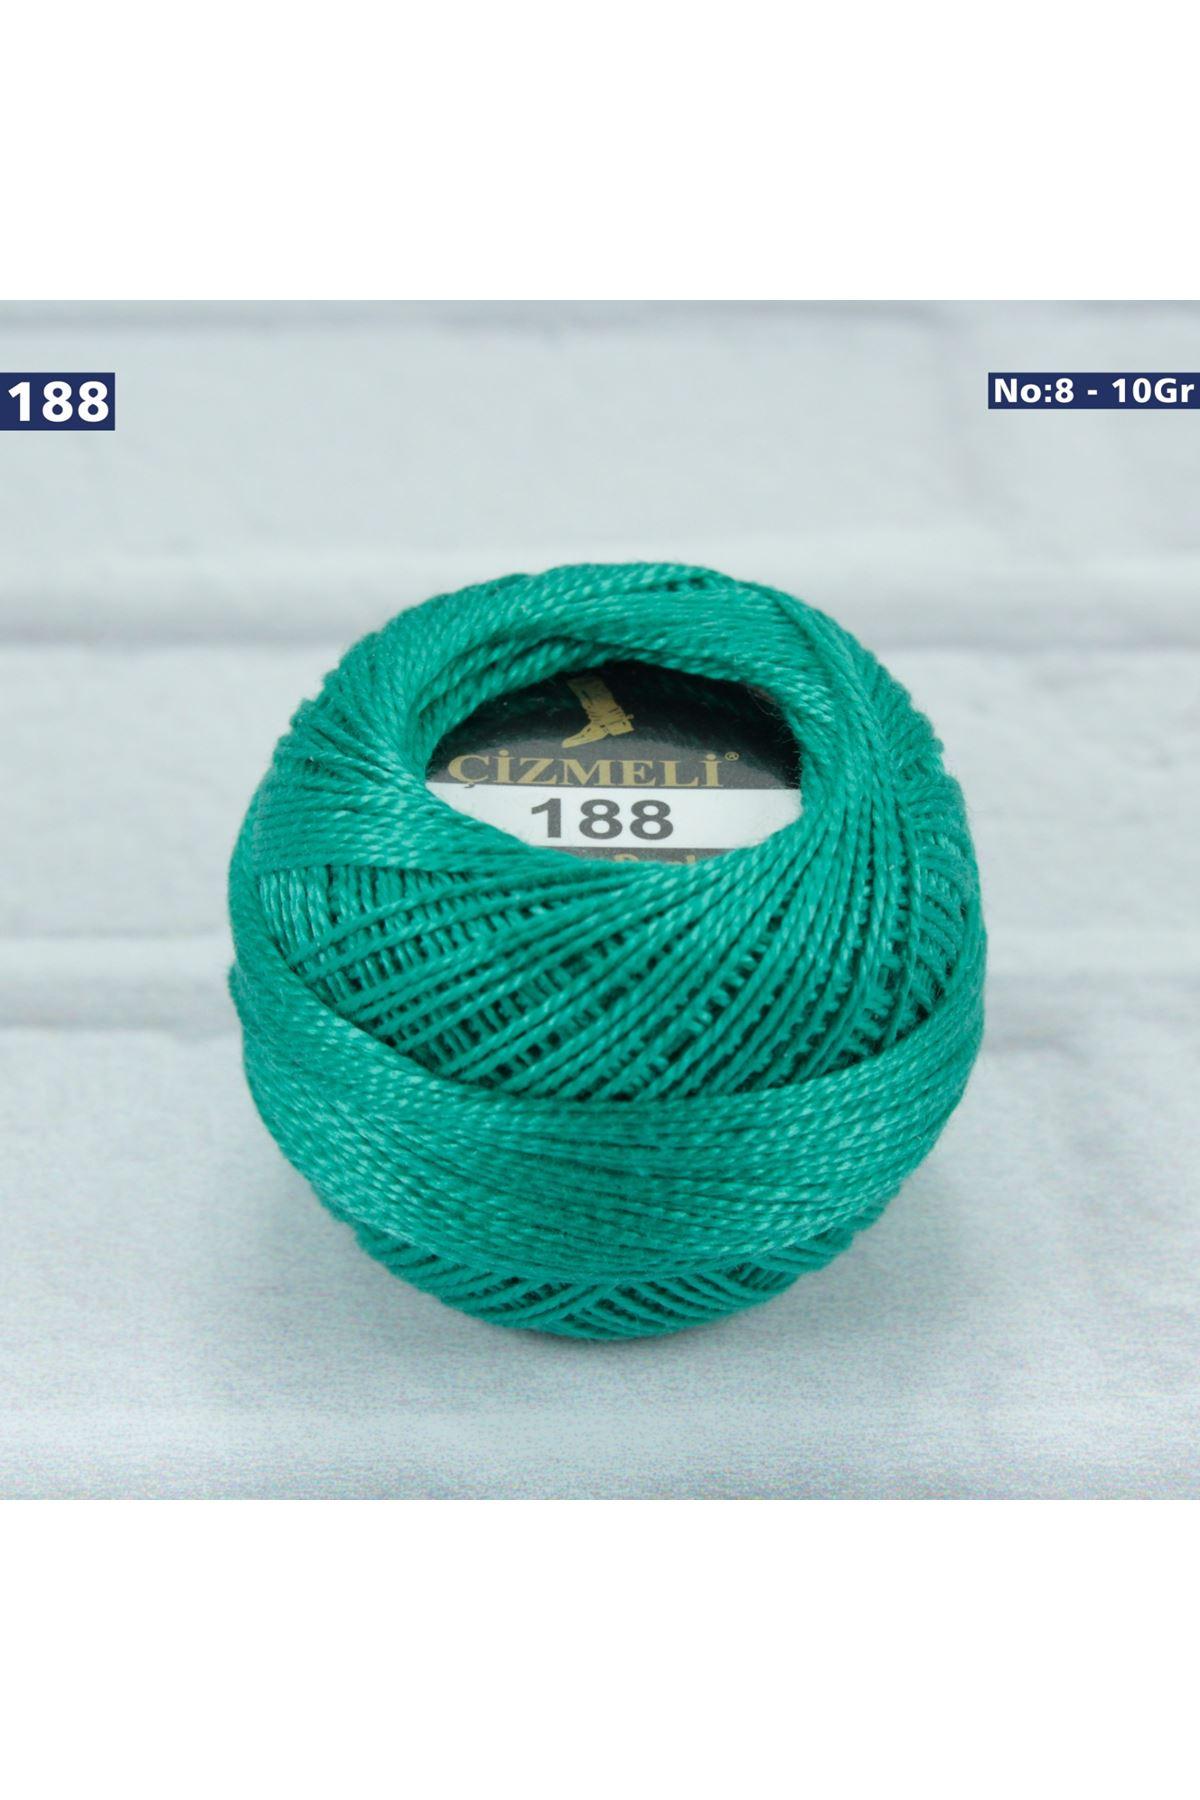 Çizmeli Cotton Perle Nakış İpliği No: 188